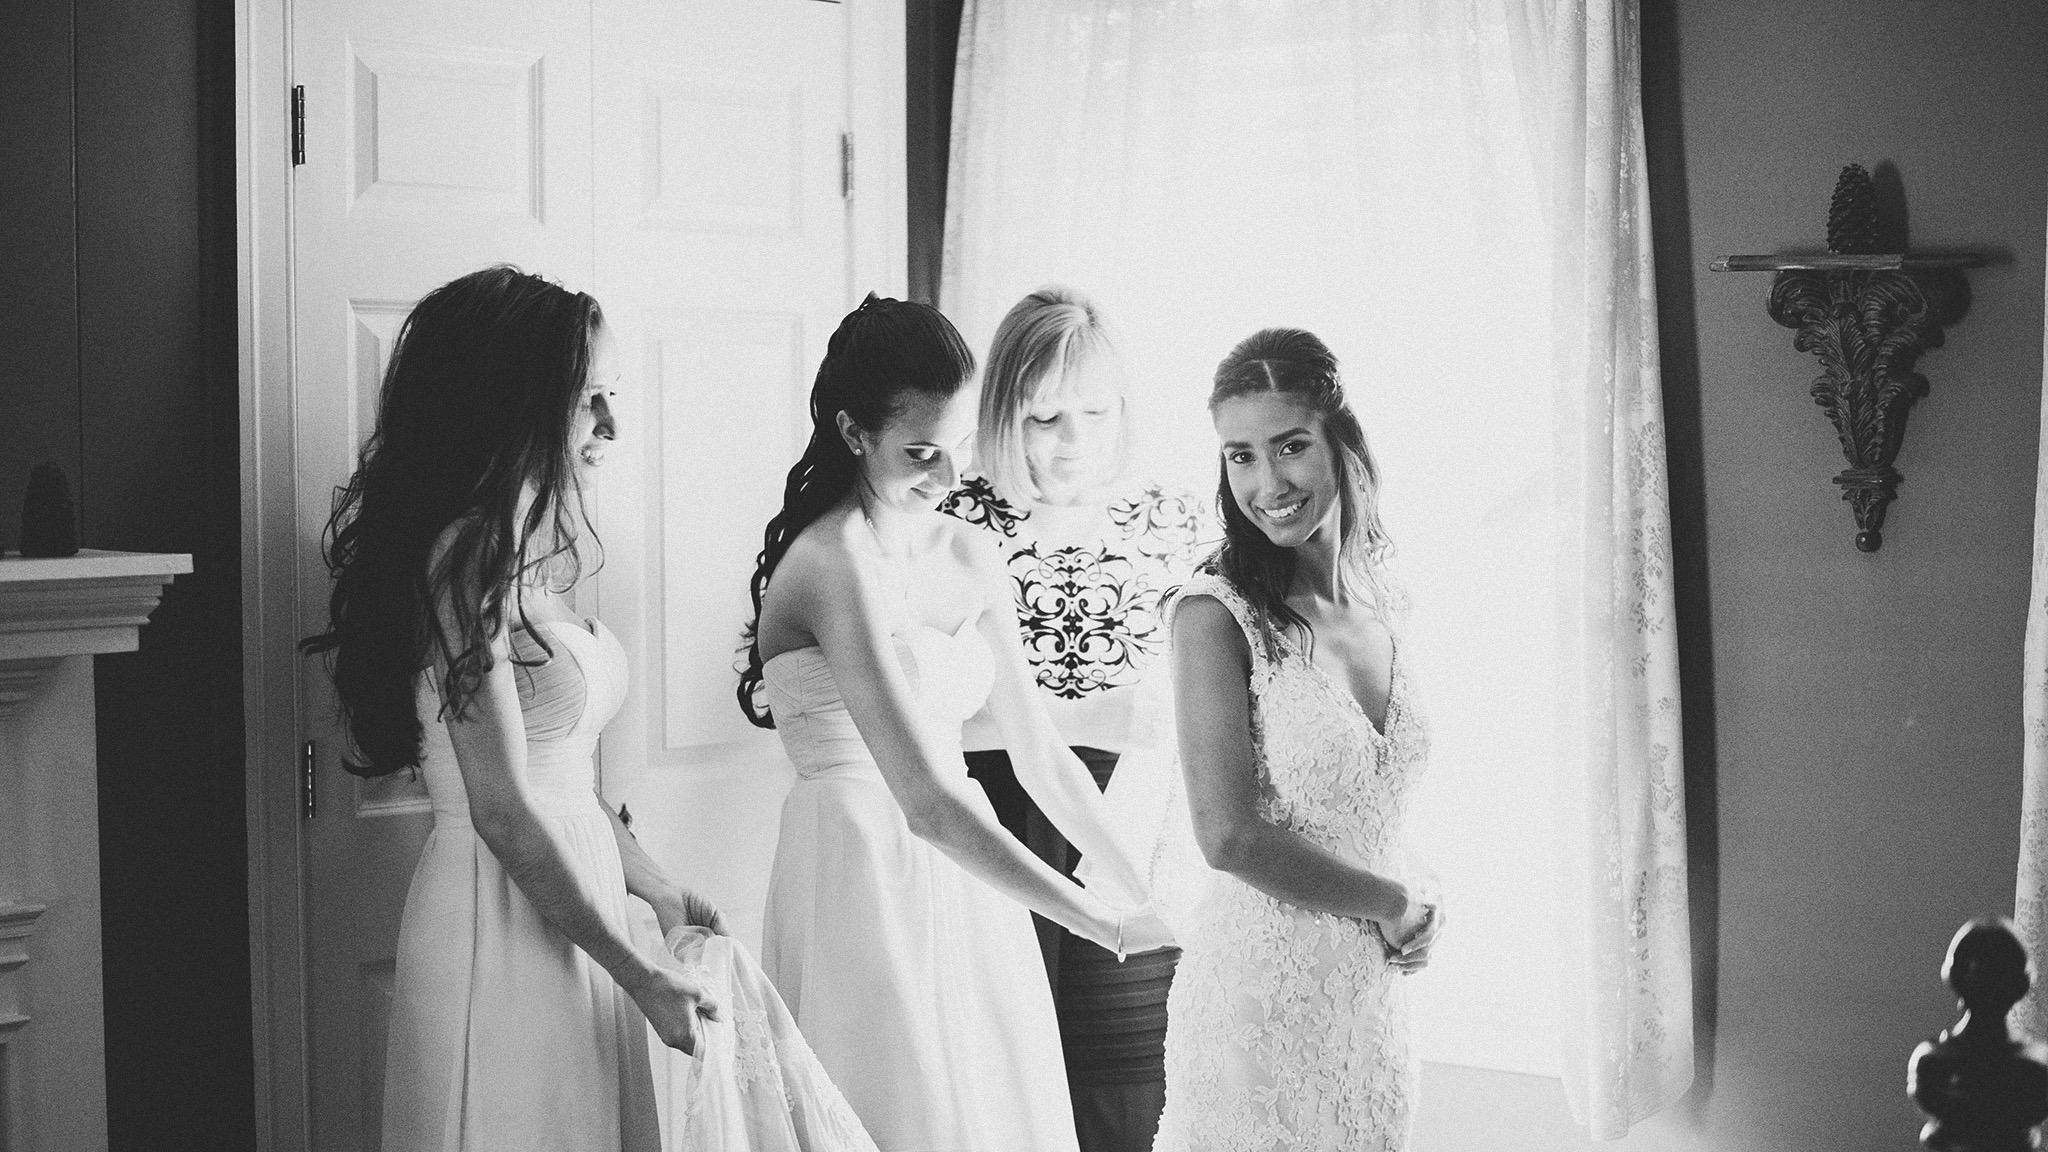 20-traditional-wedding-prep-photos.jpg